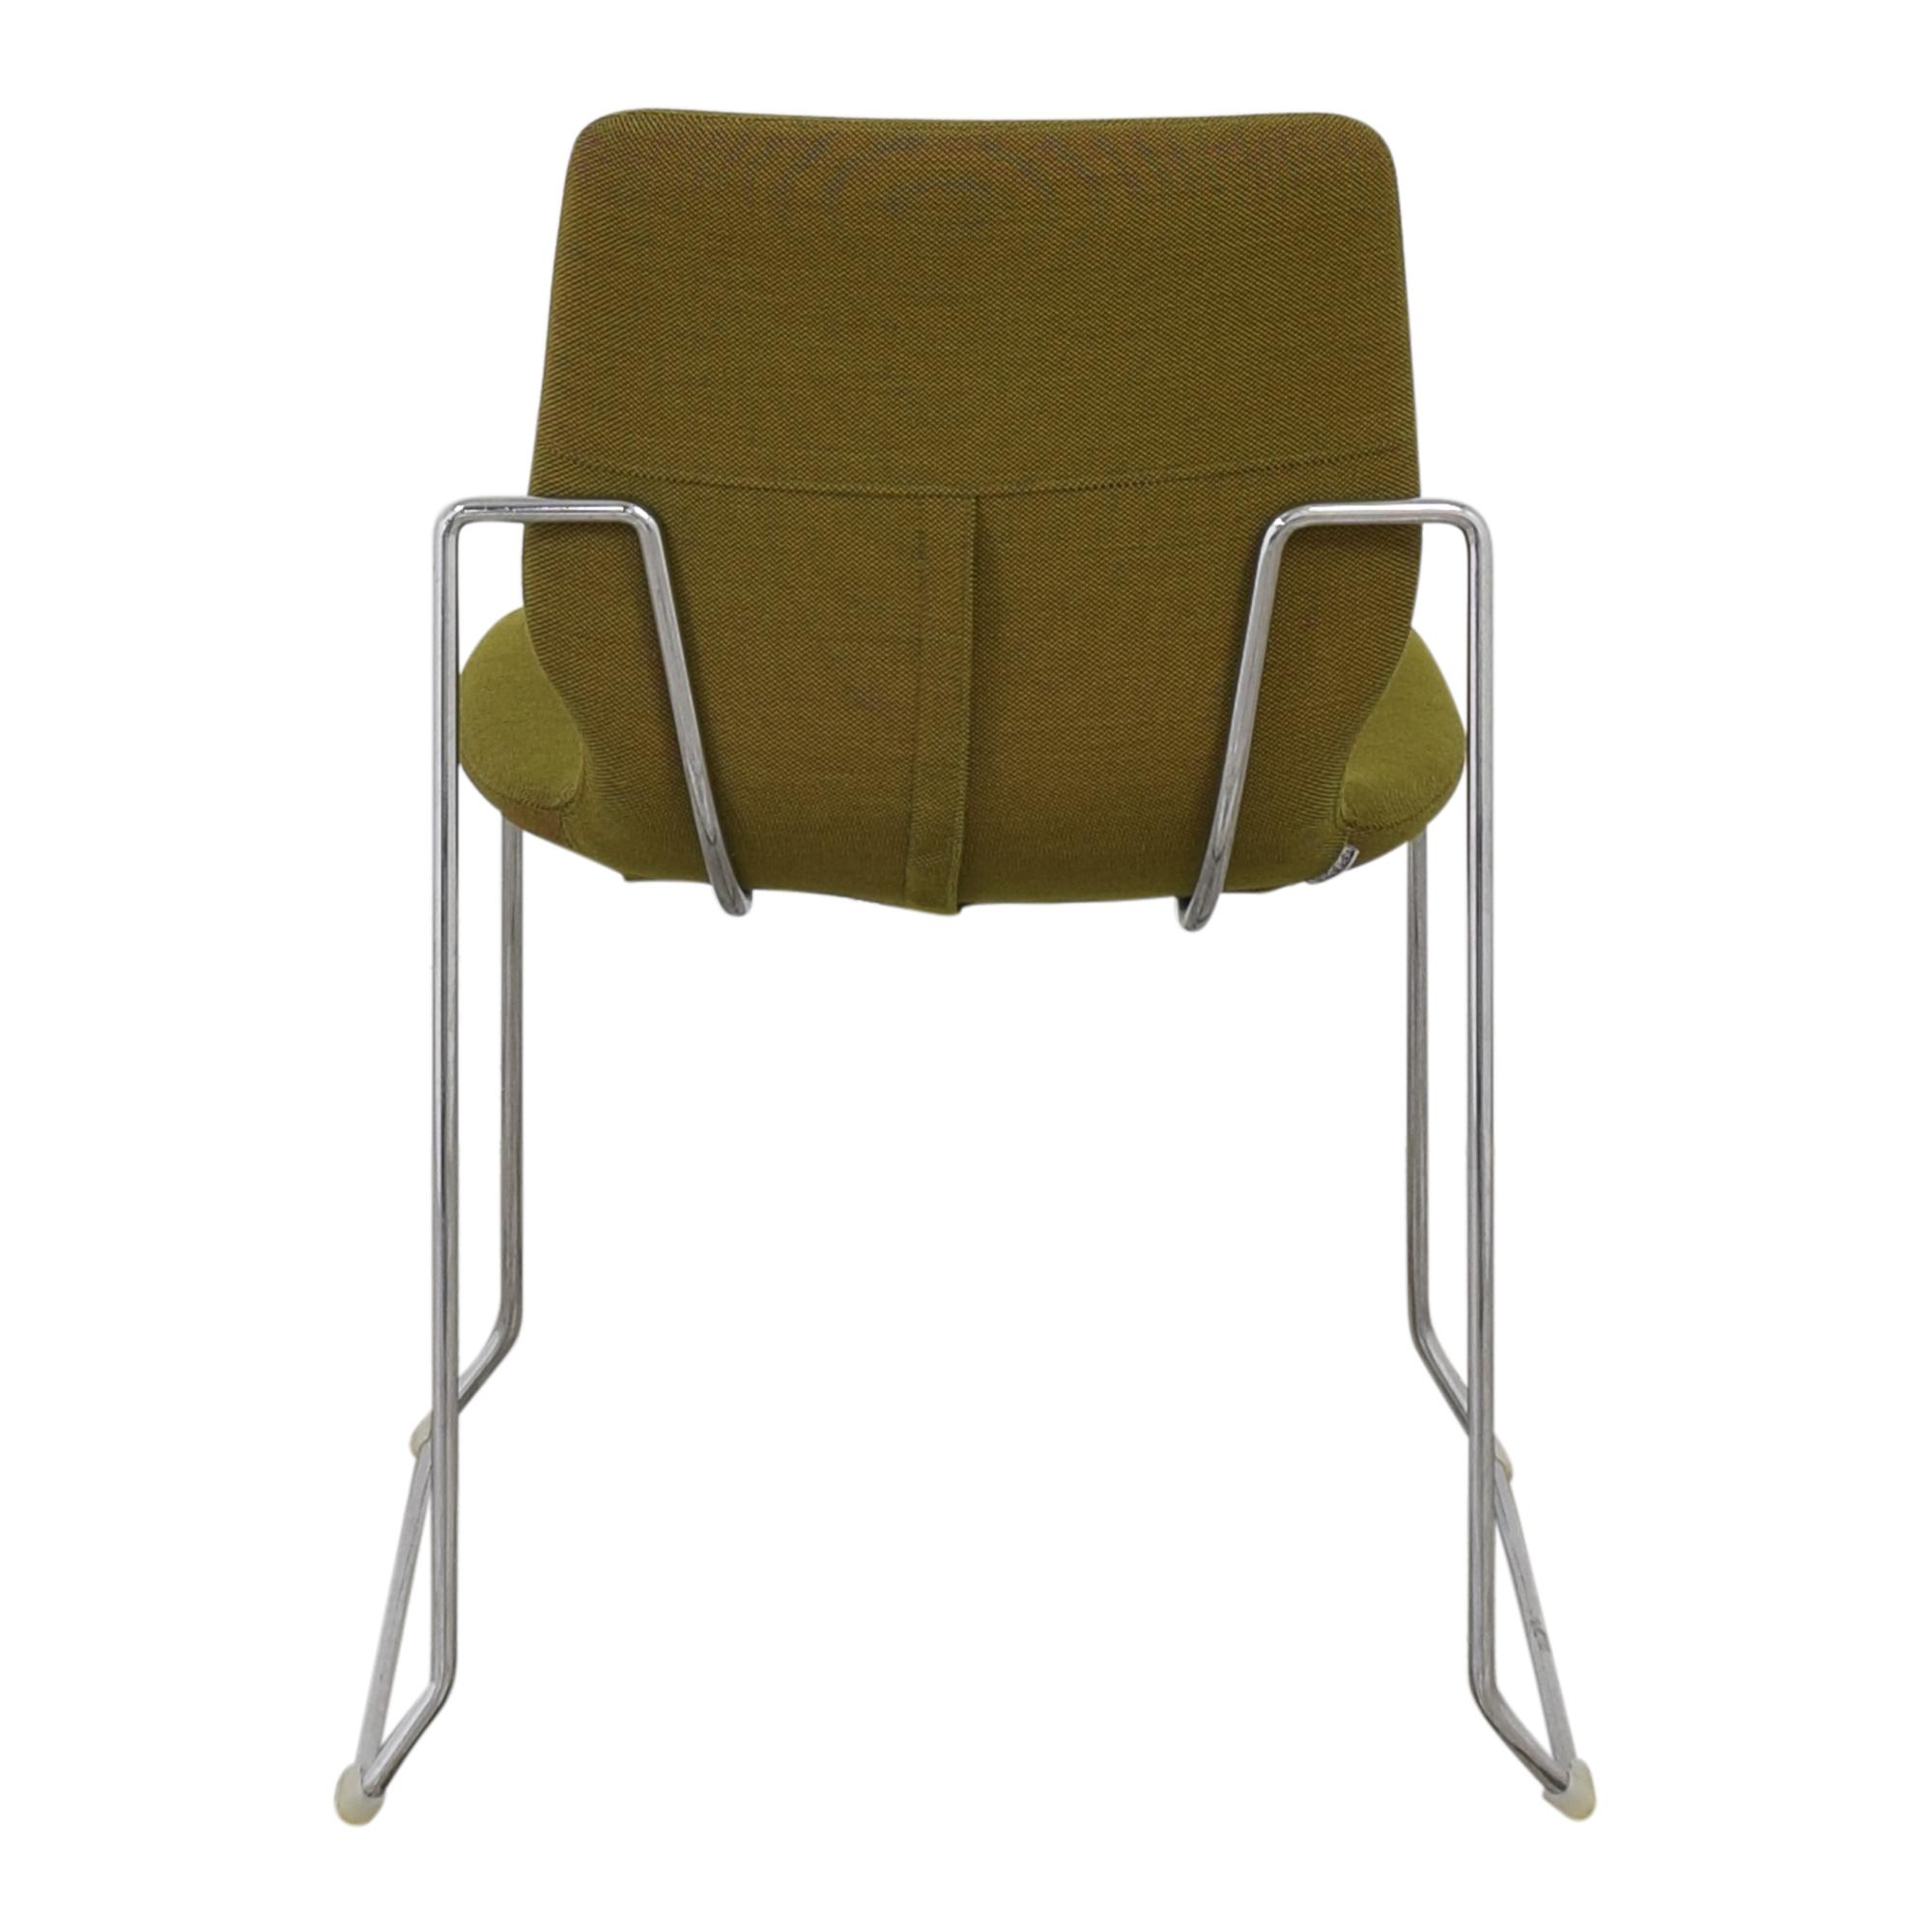 Koleksiyon Asanda Armless Chair / Accent Chairs